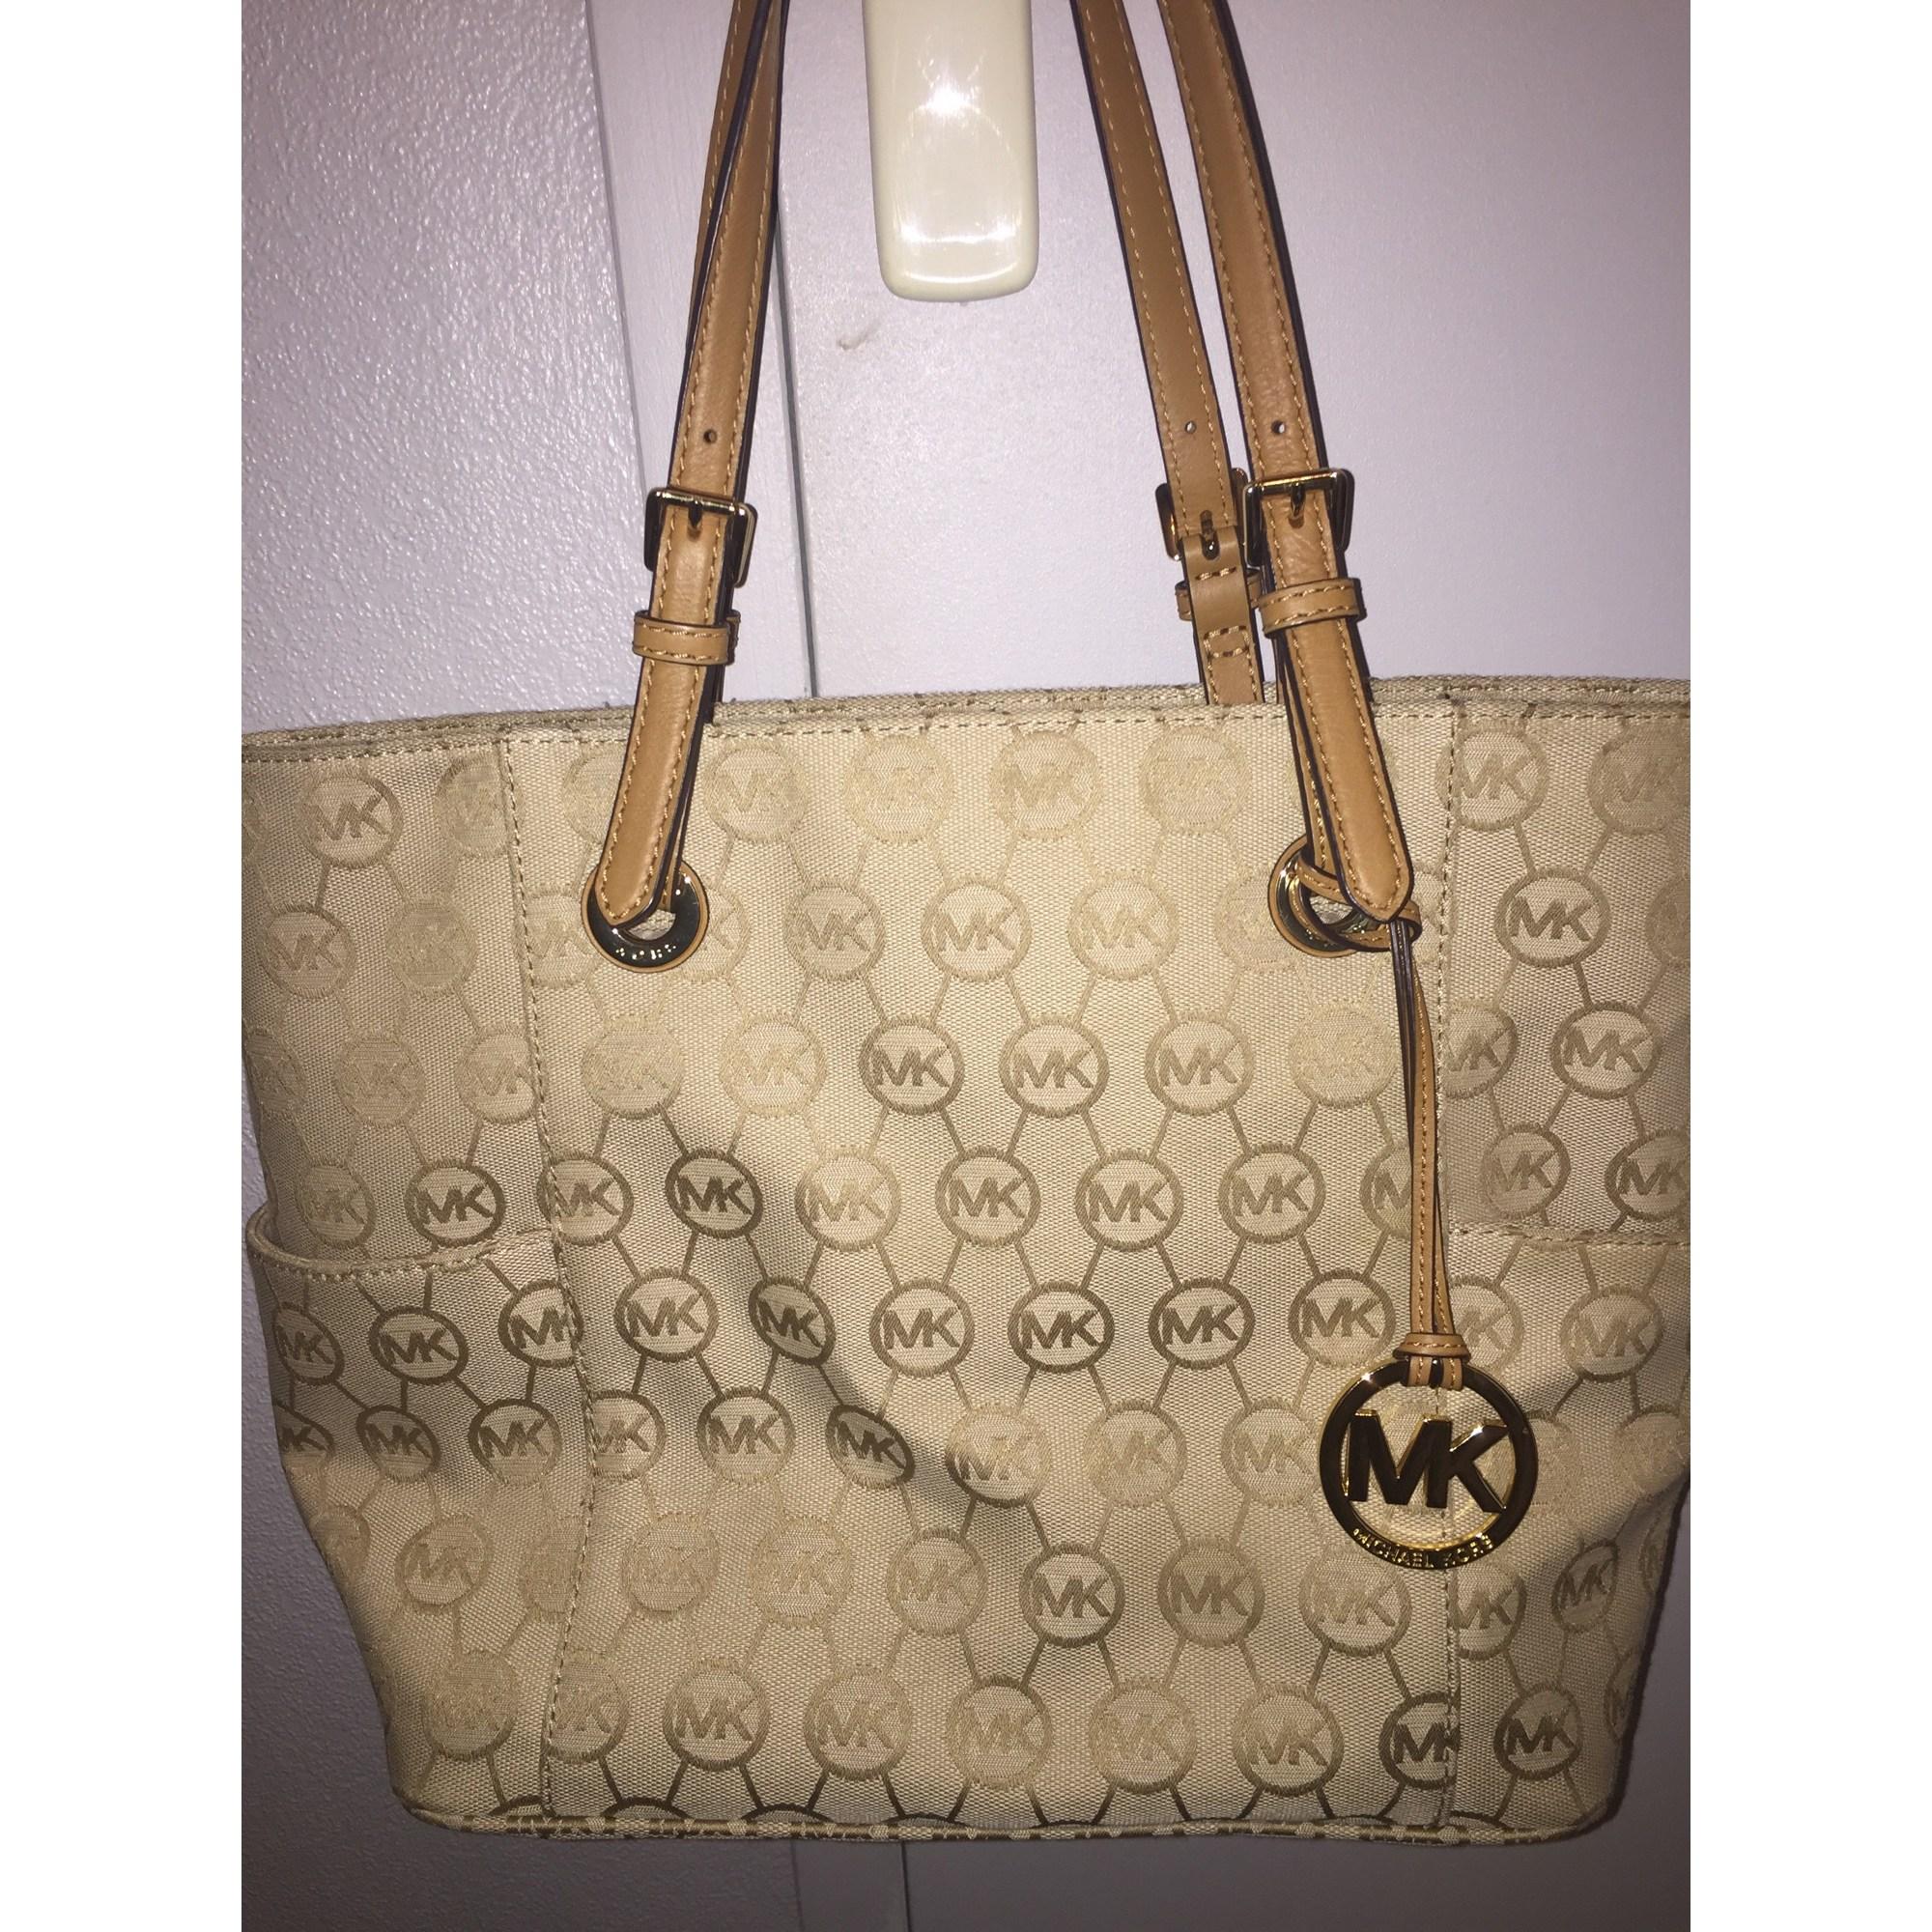 a4c8531737b1 Non-Leather Handbag MICHAEL KORS beige vendu par Melody84 - 3641081